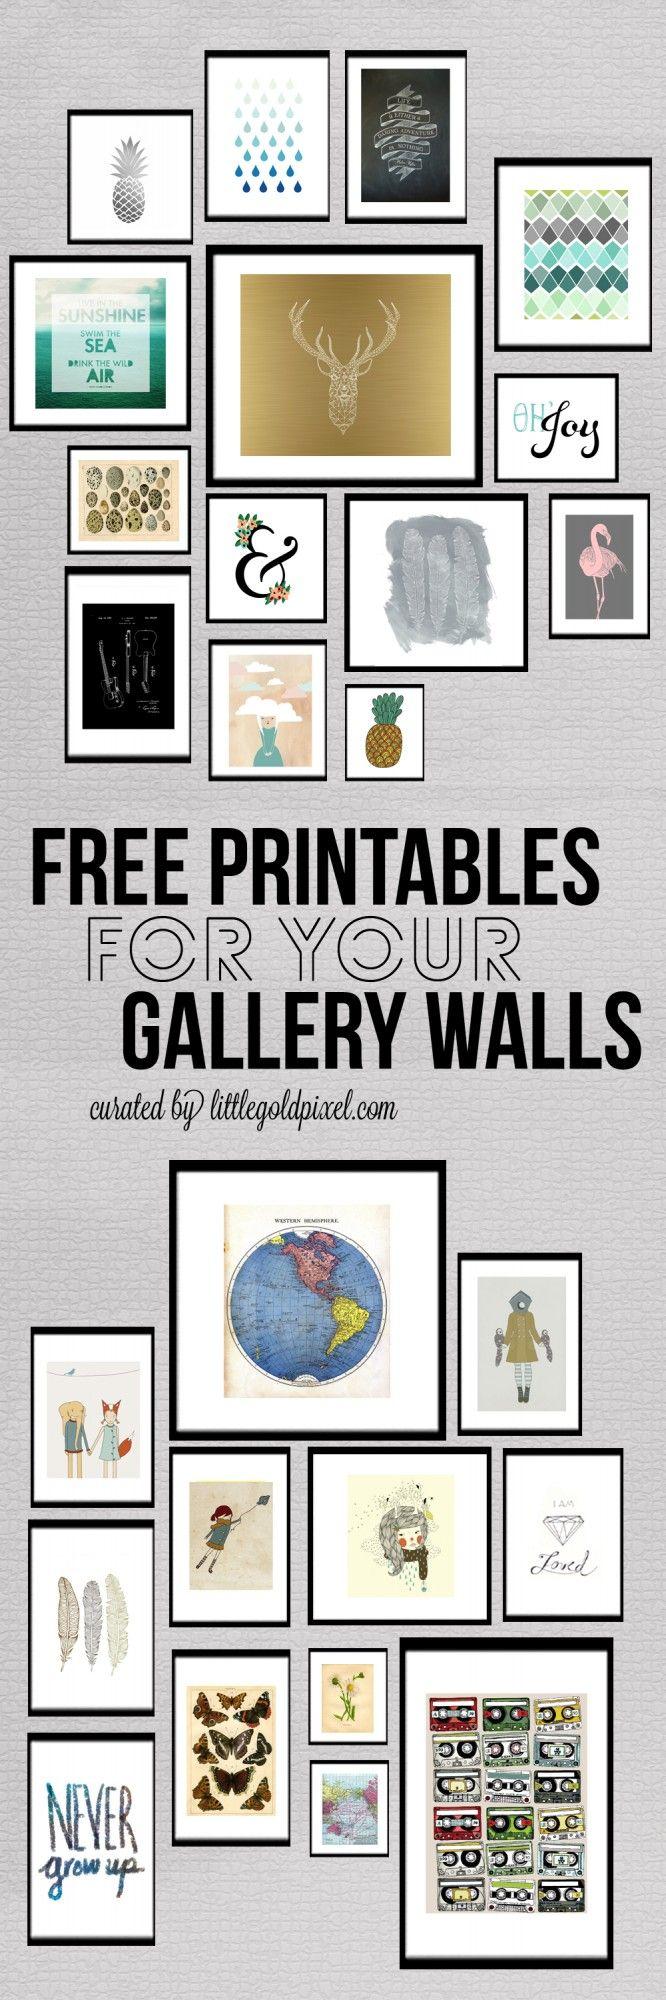 Free Art Printables • Design Resources • Little Gold Pixel